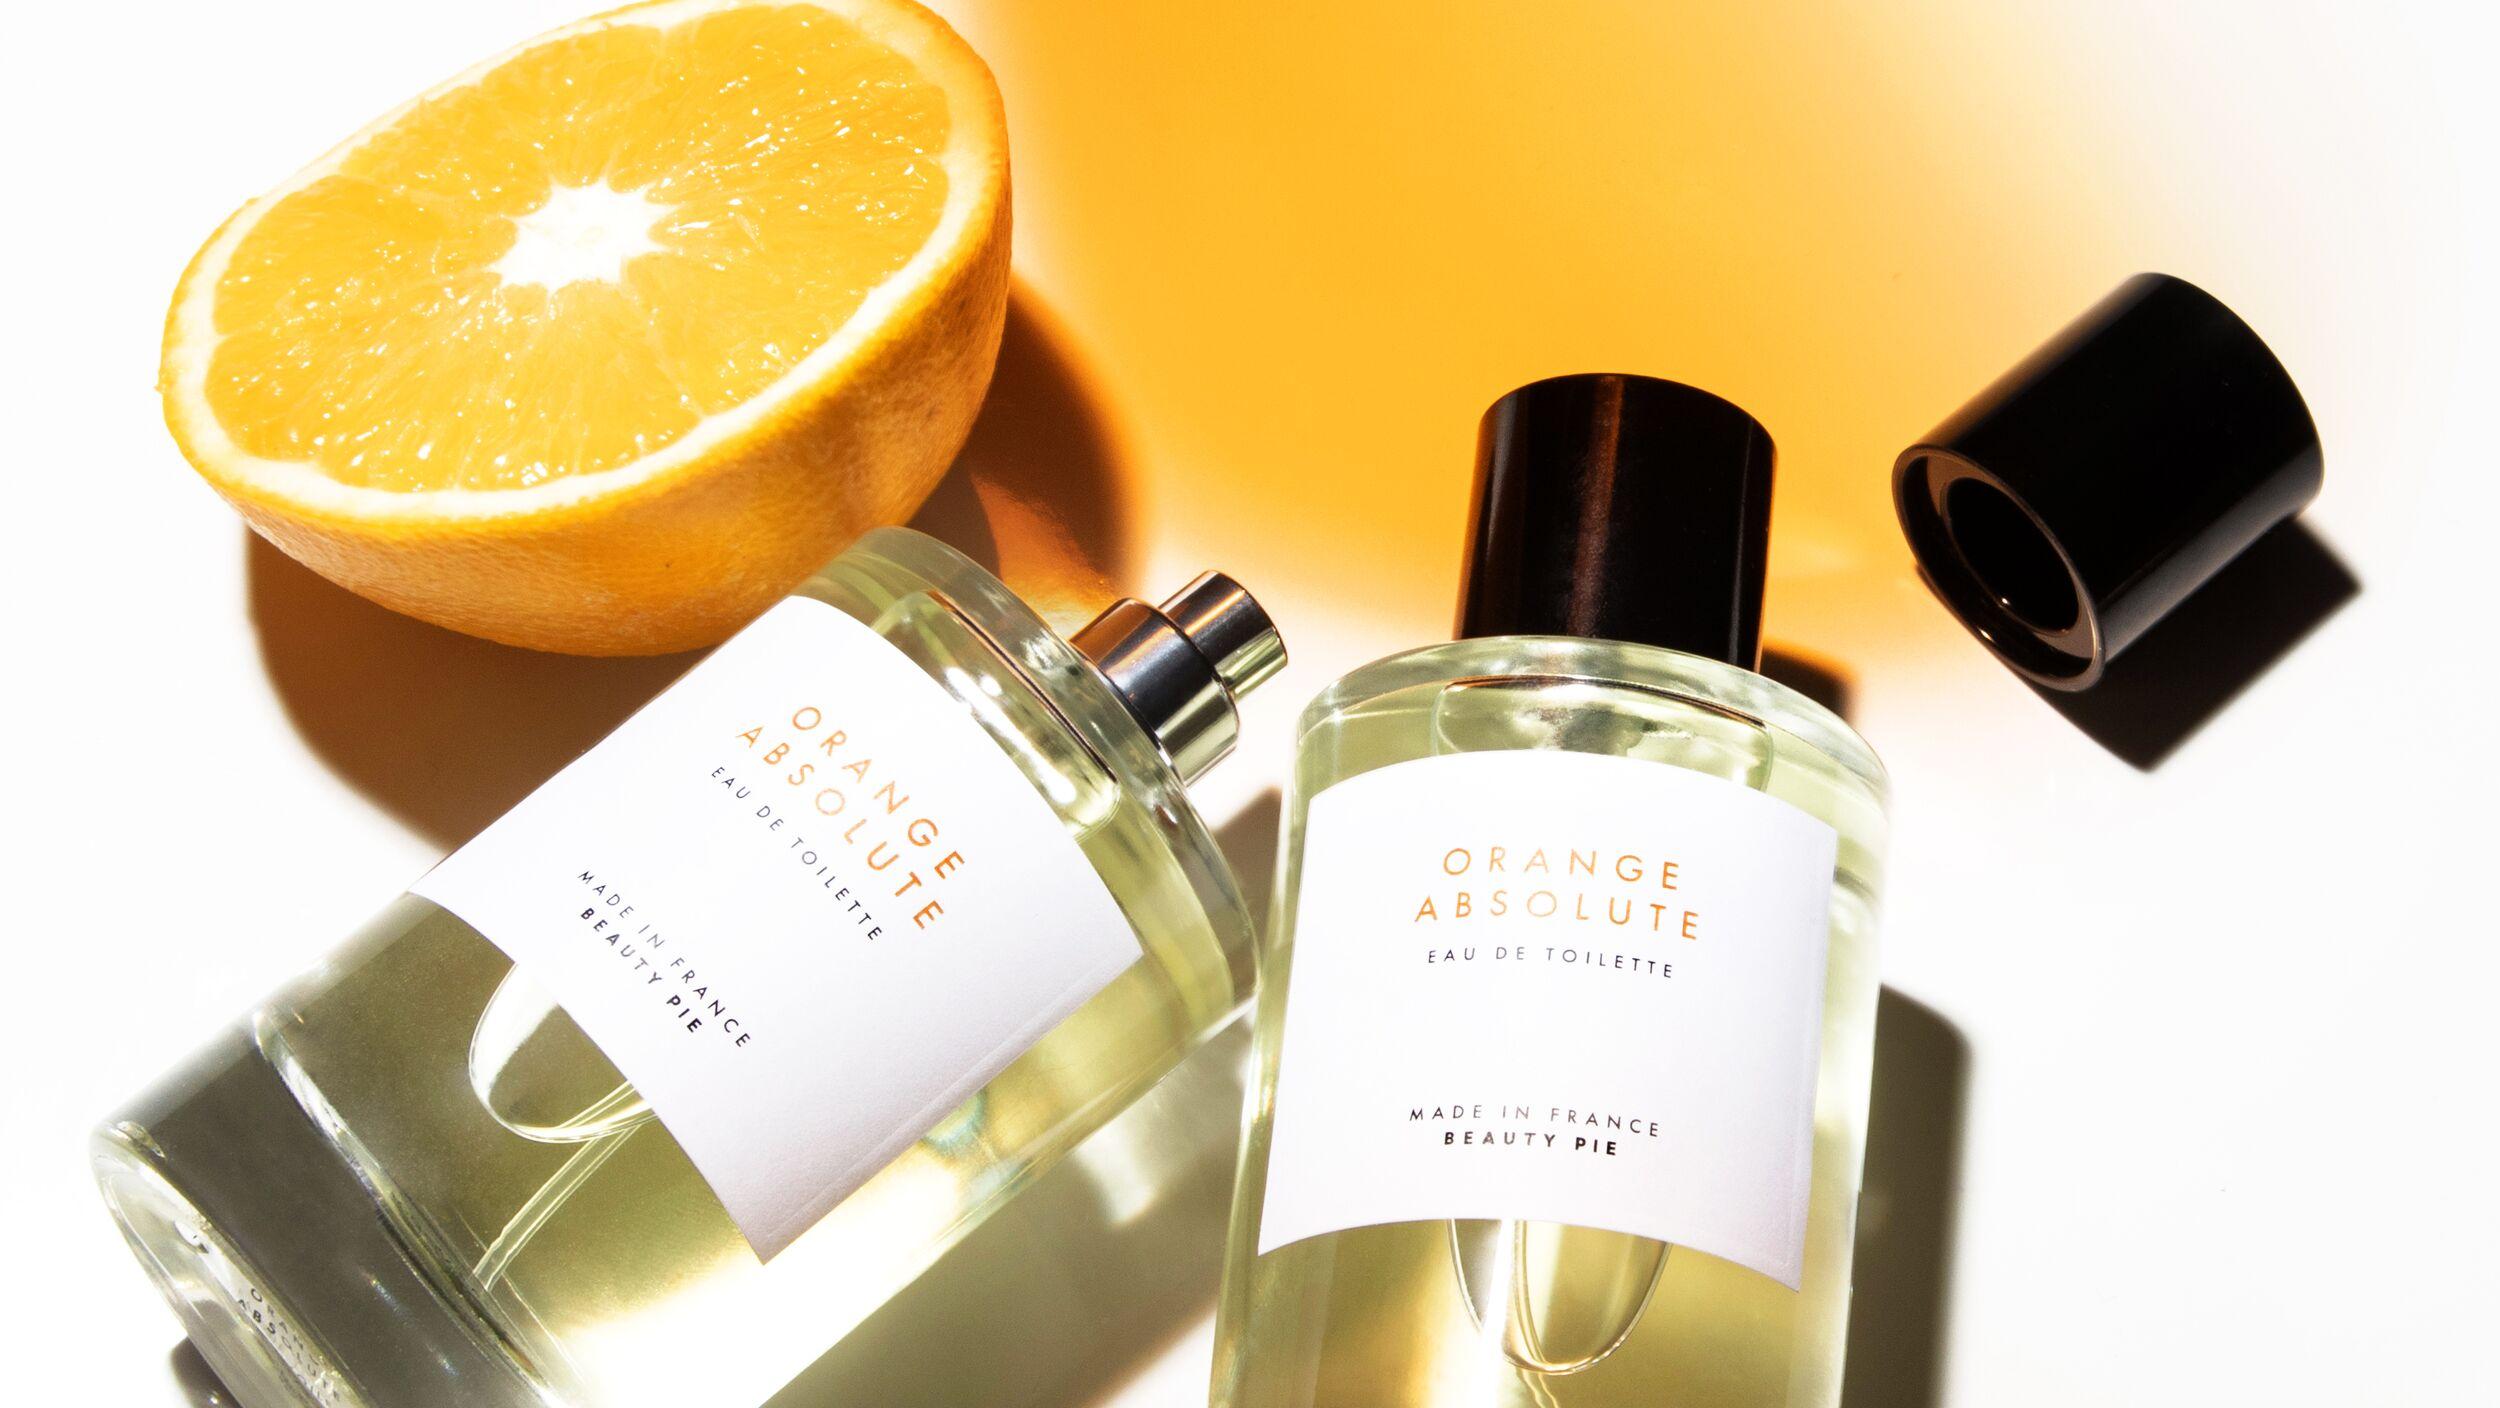 Orange Absolute EDP Fragrance by BEAUTY PIE